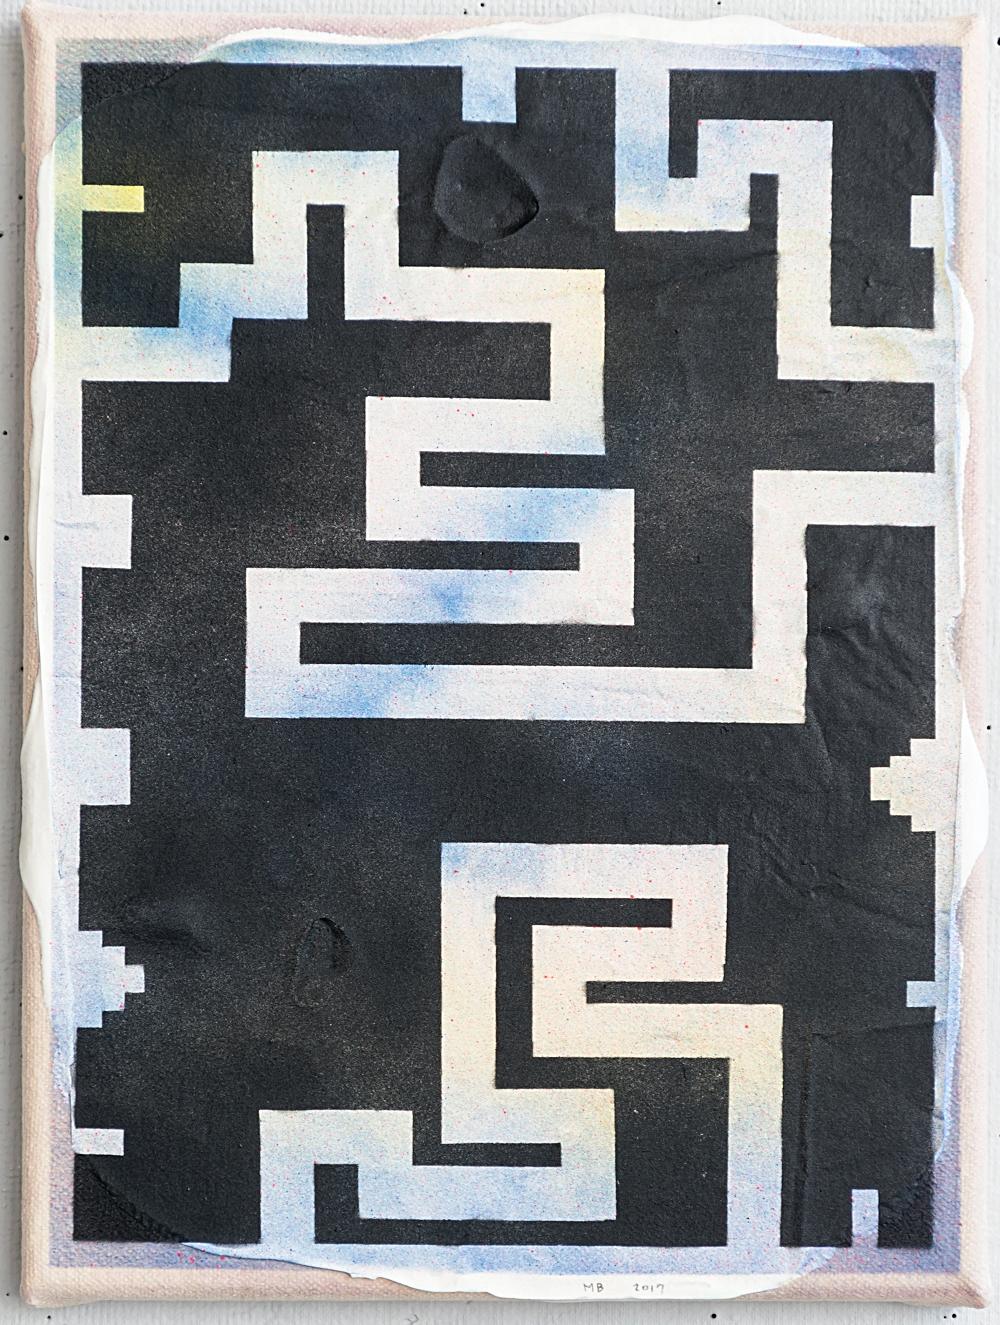 k1.107.17.jpg